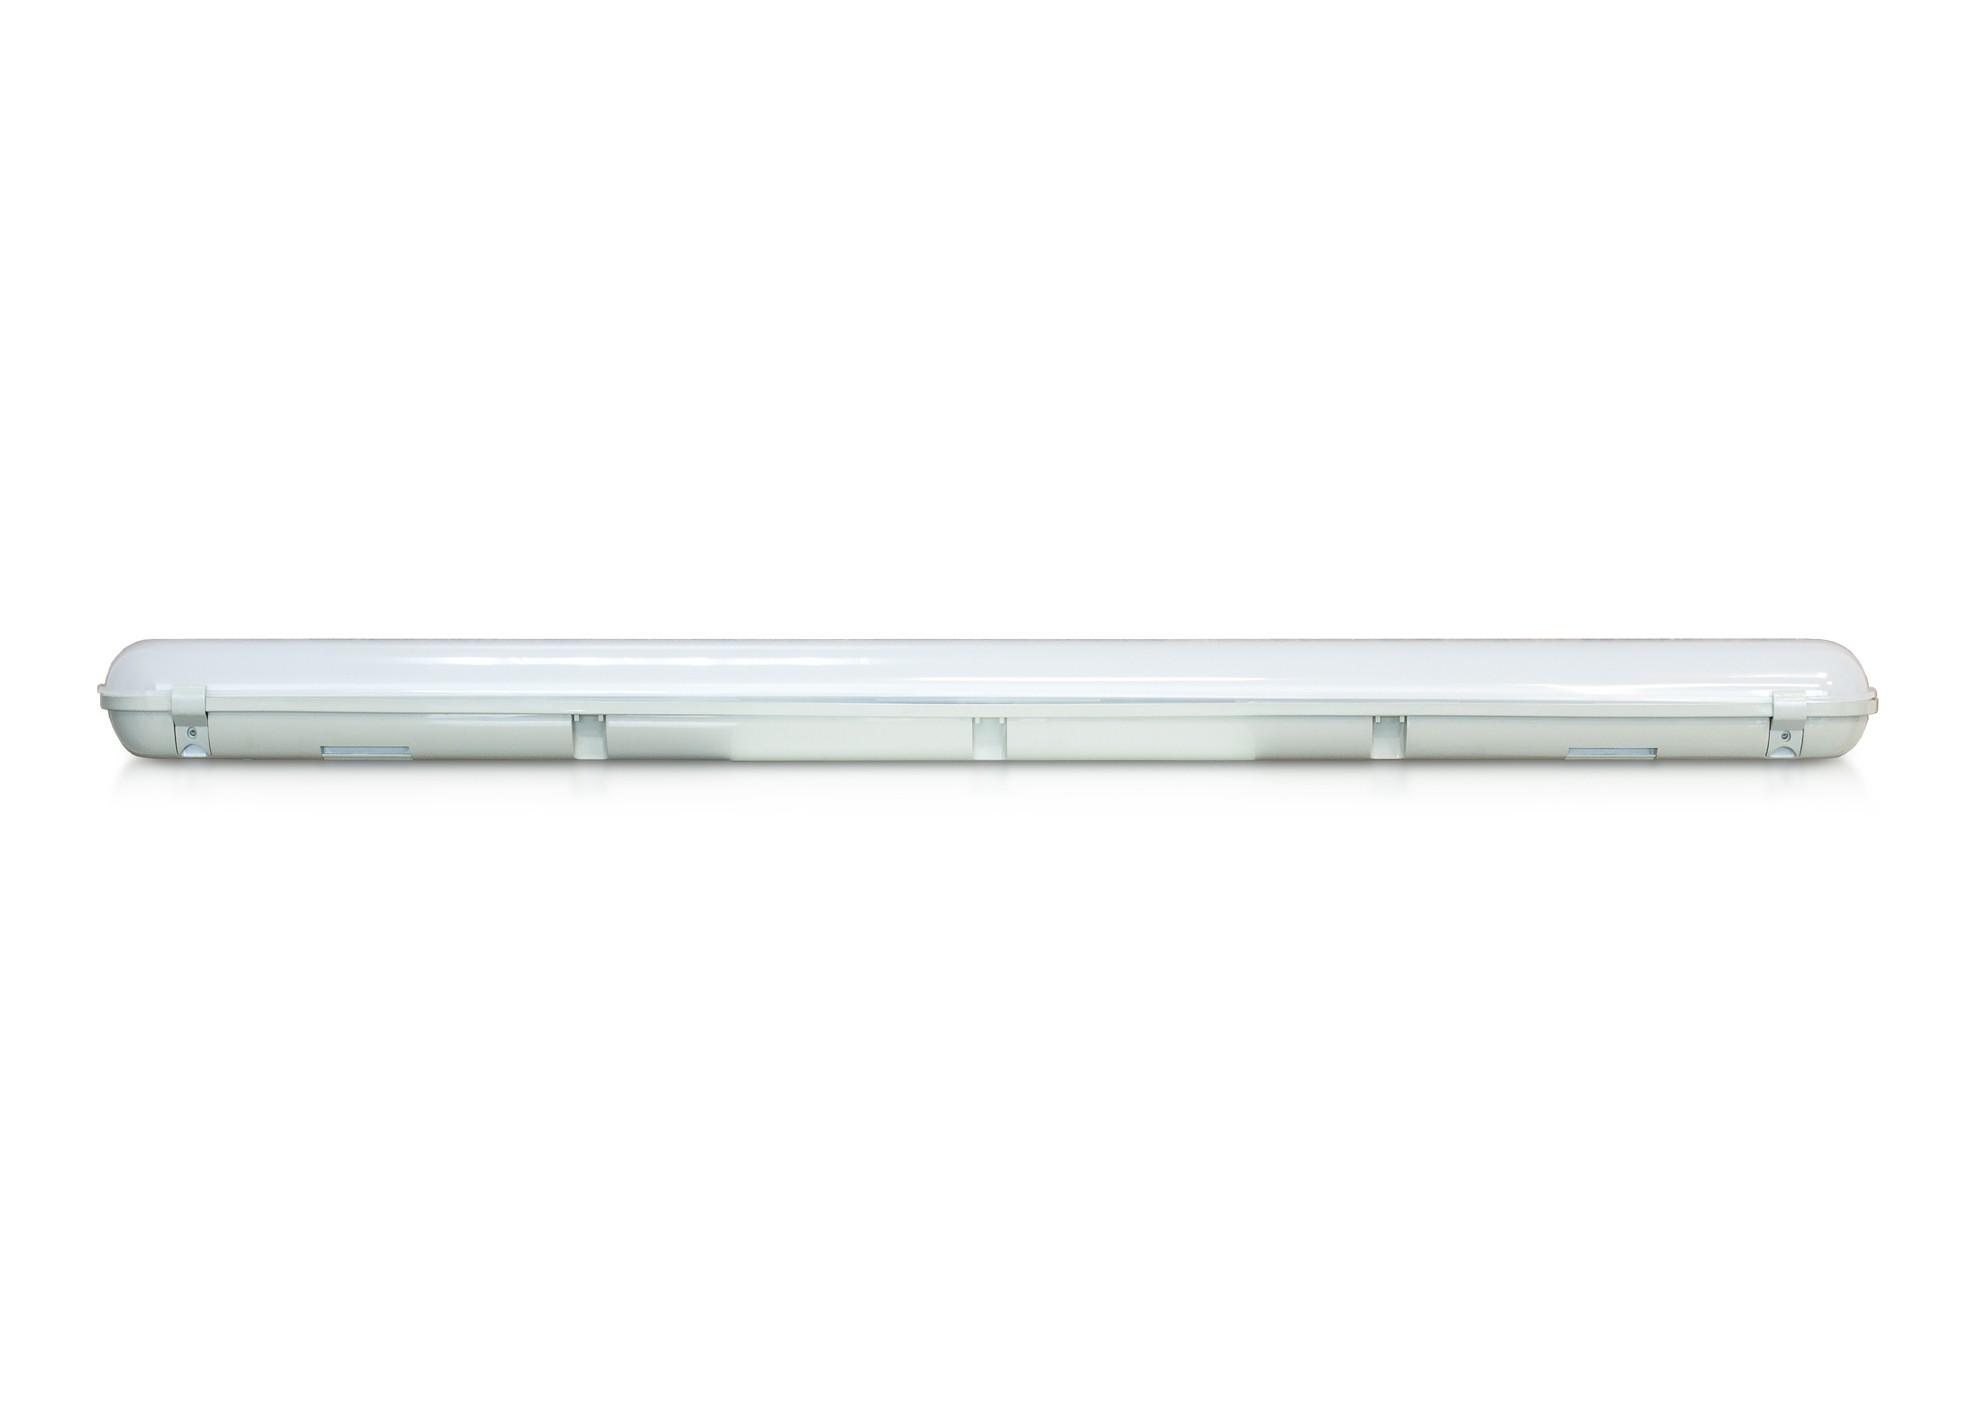 LED LINEAR 70W, natural 4000K, 8400LM, 150cm, IP65